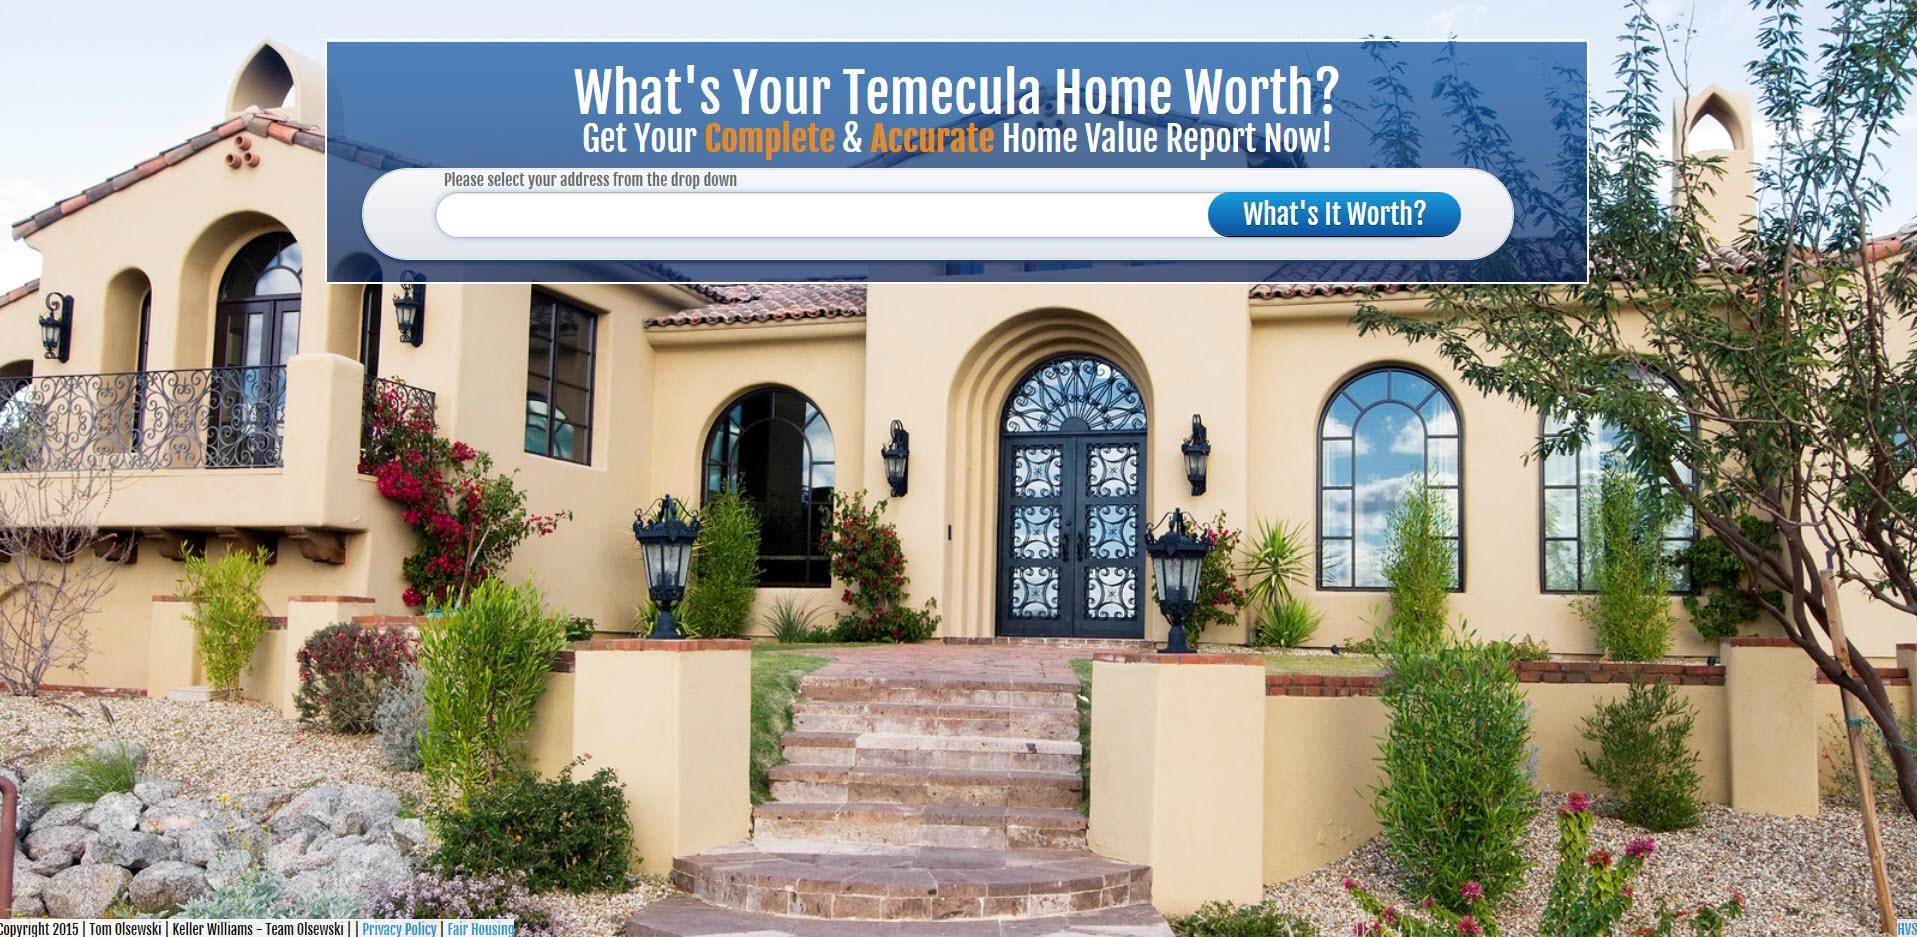 Temecula Home Value